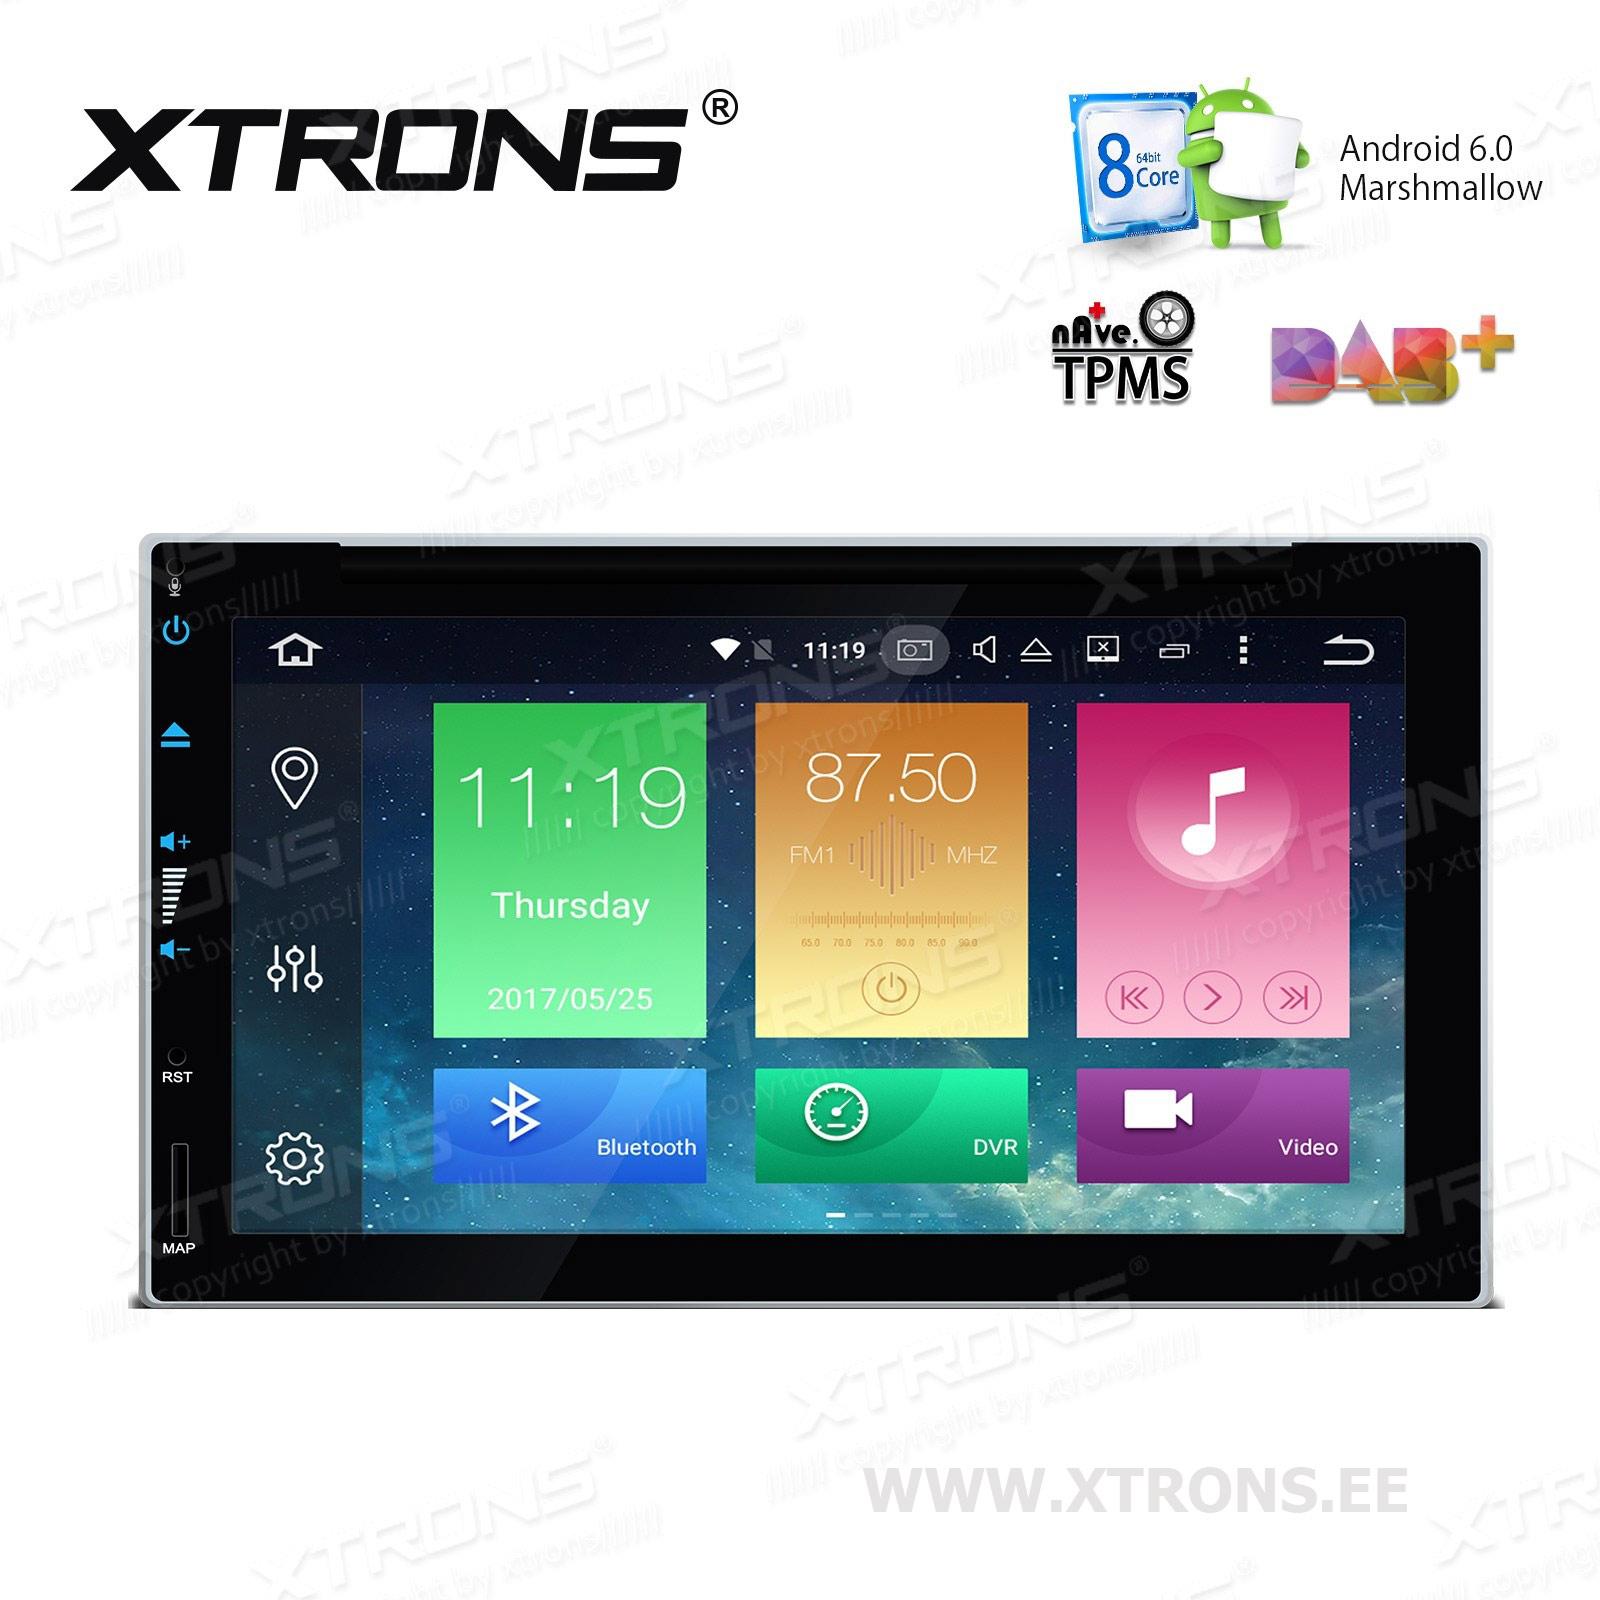 XTRONS TB697P